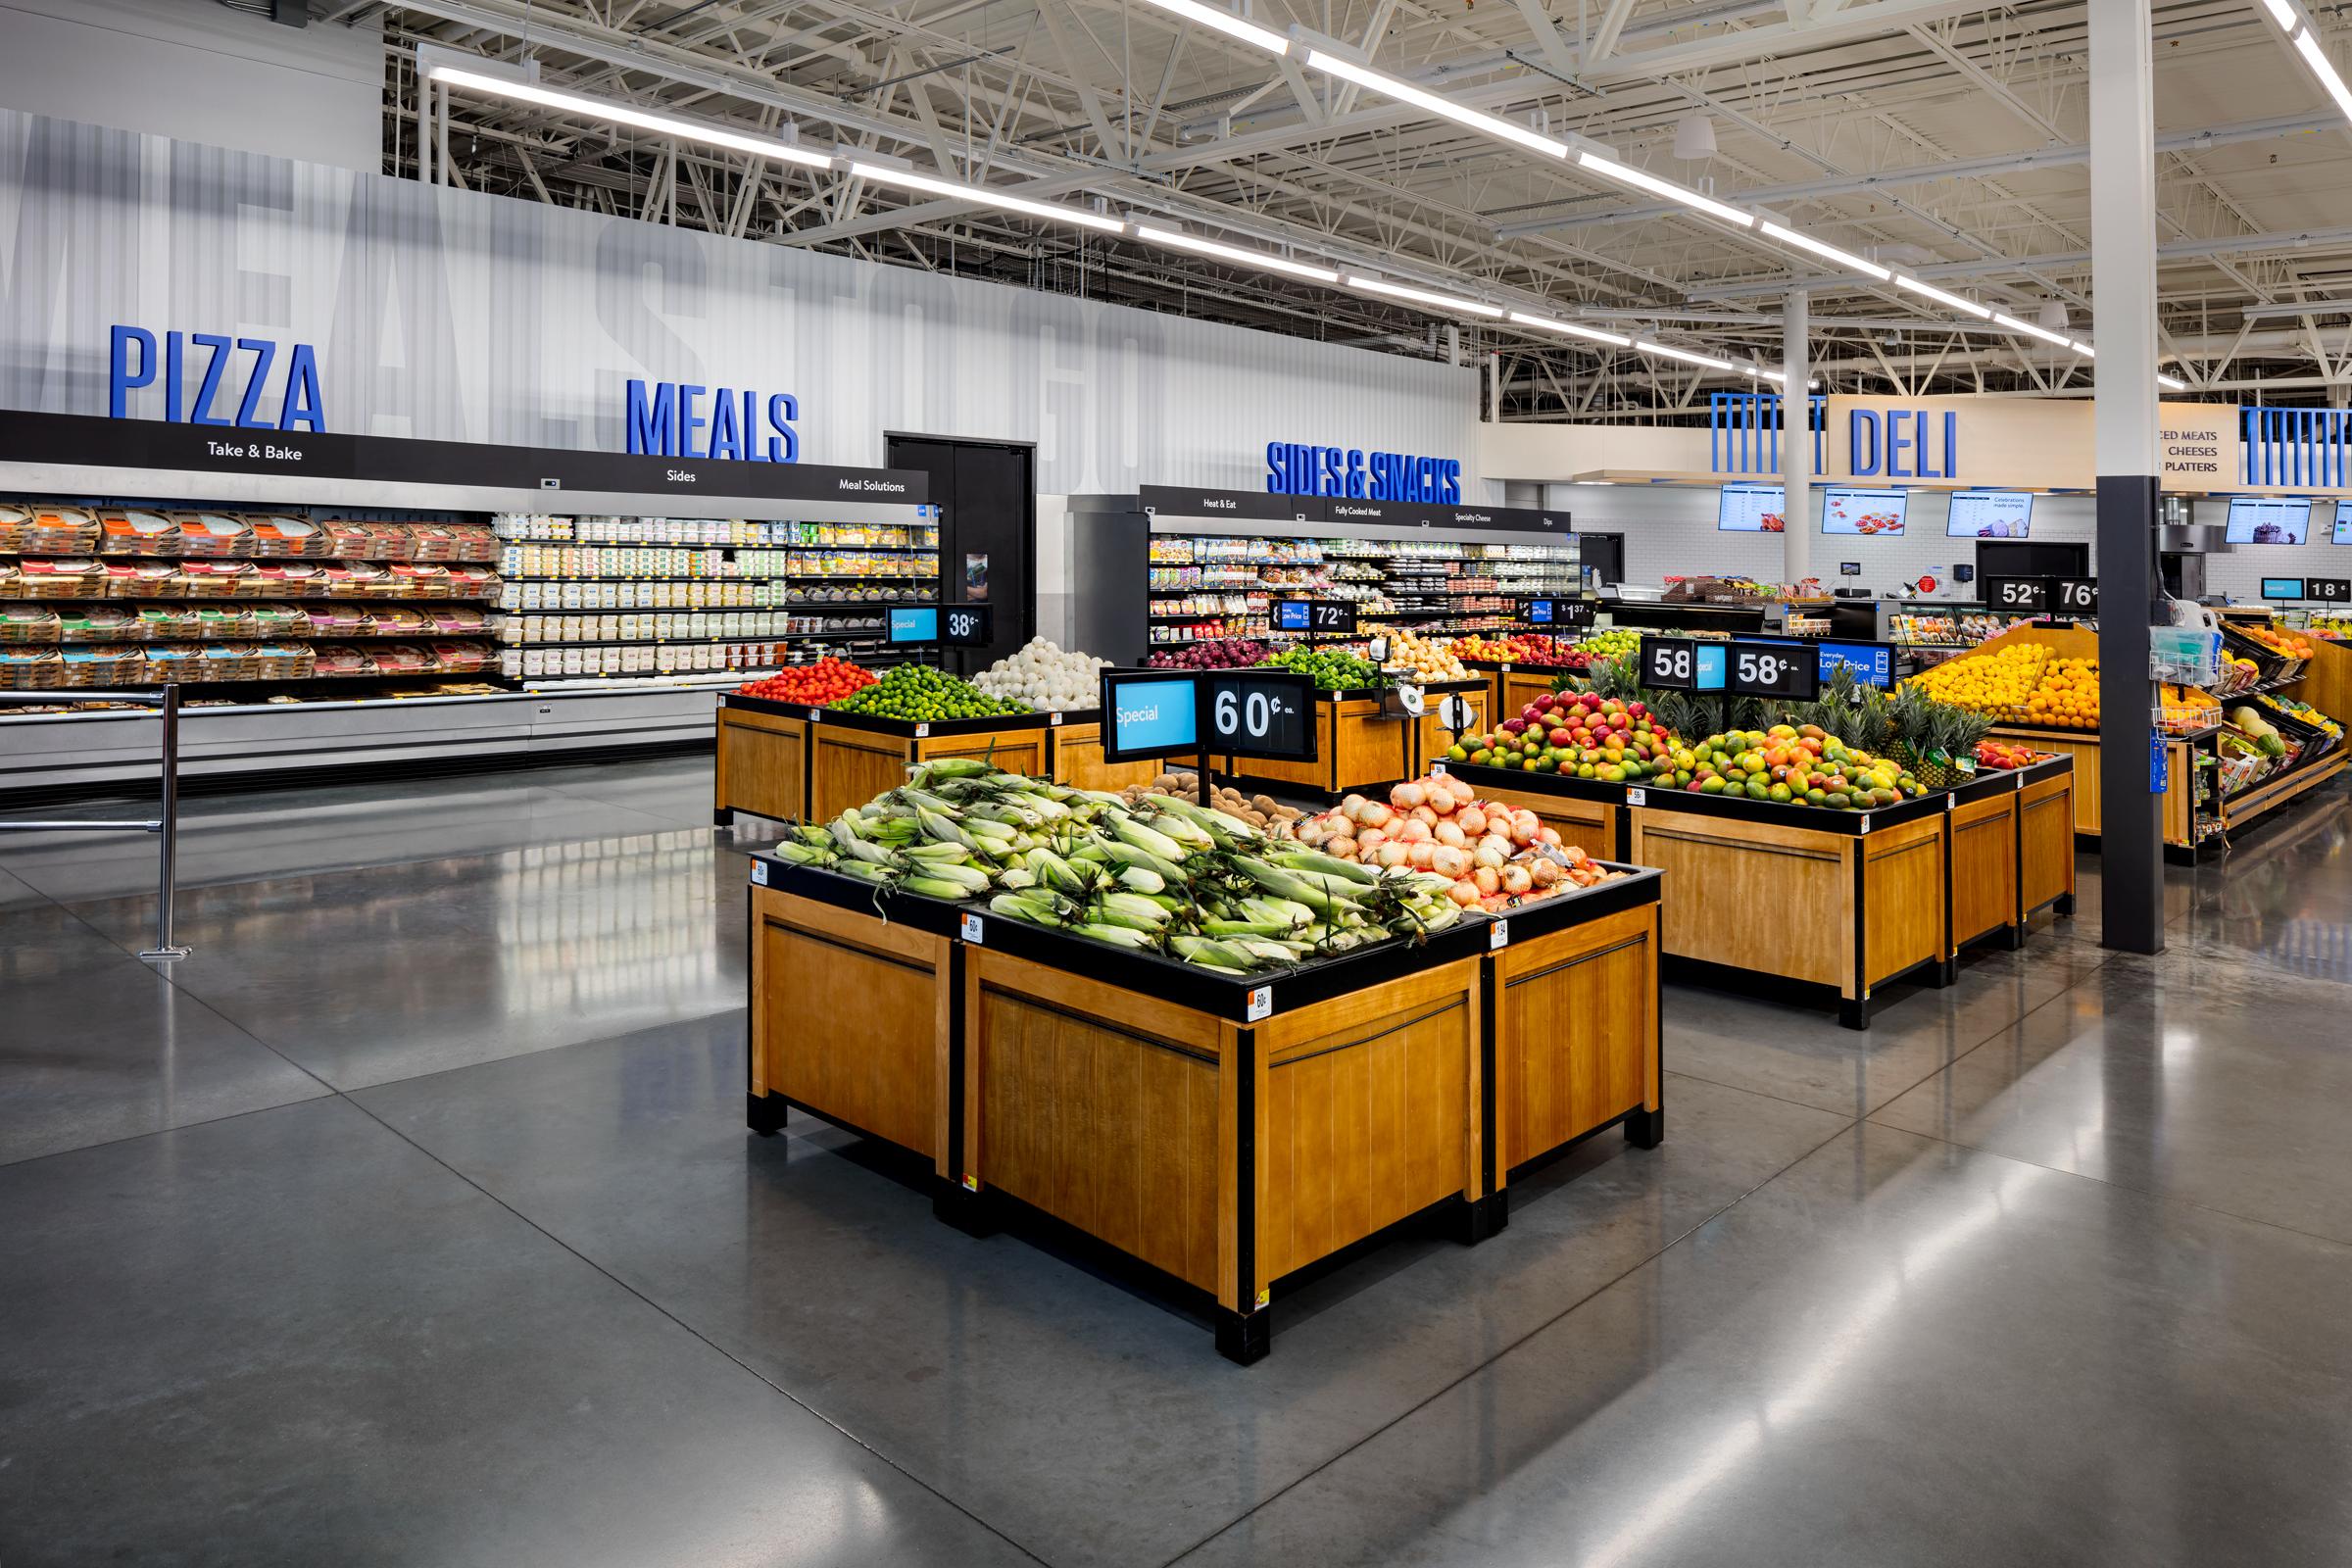 Walmart's New Store Design Reflects E-Commerce Values